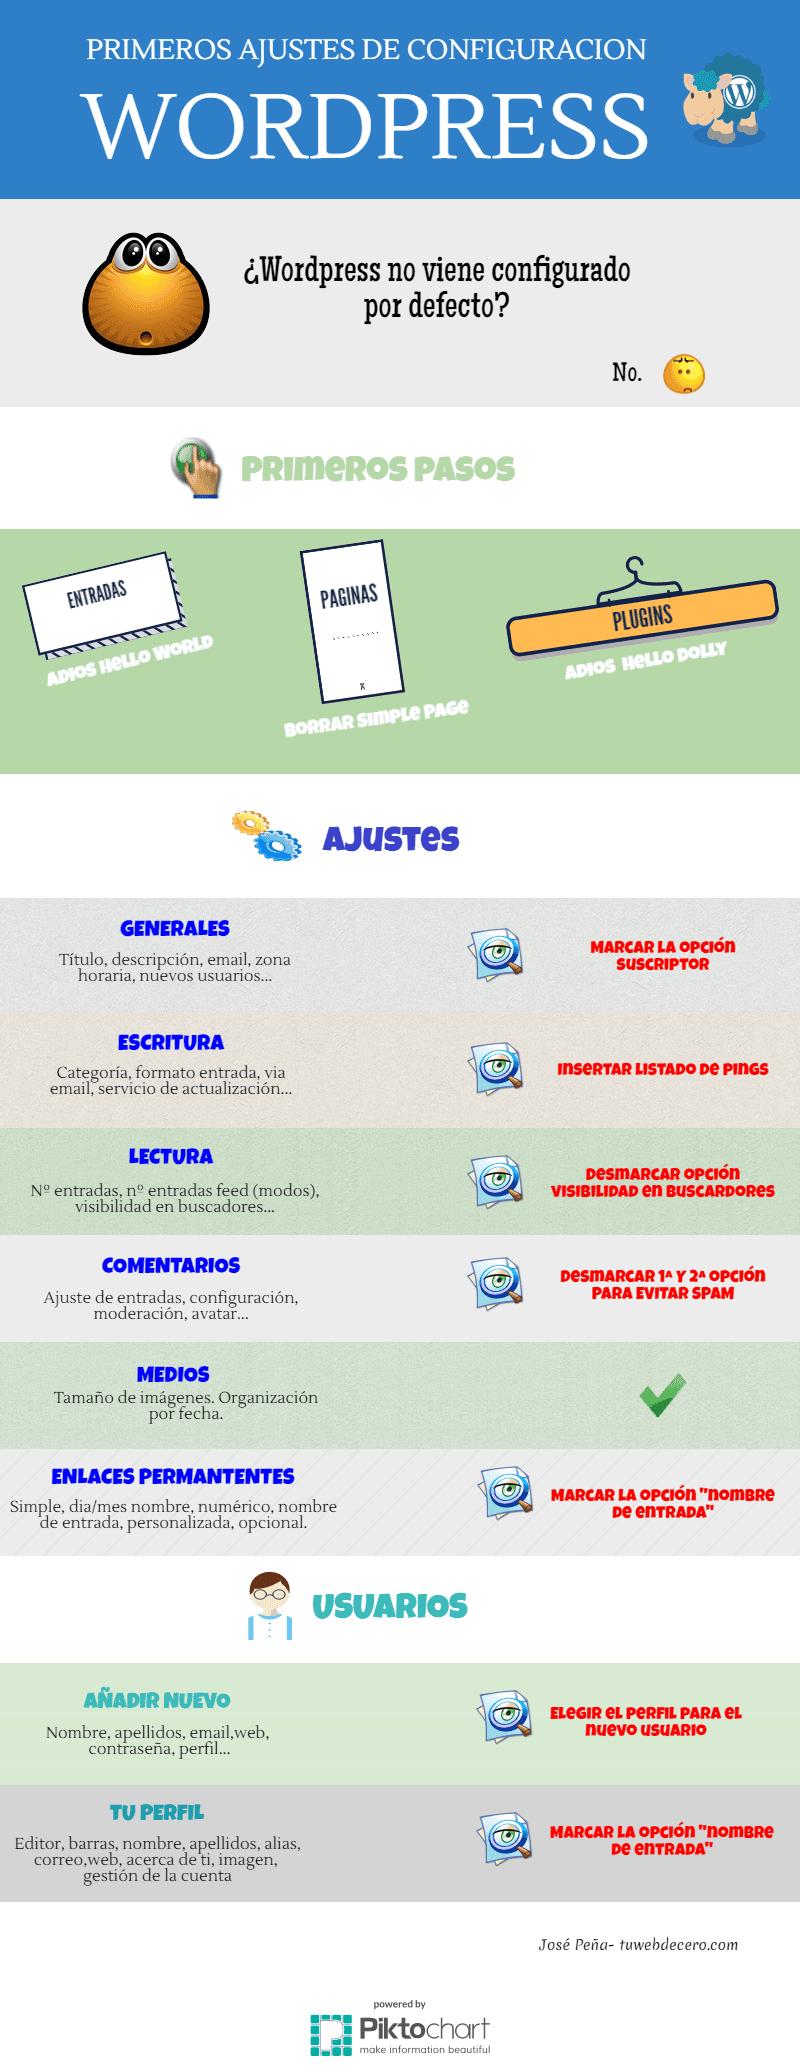 Primeros ajustes para configurar wordpress